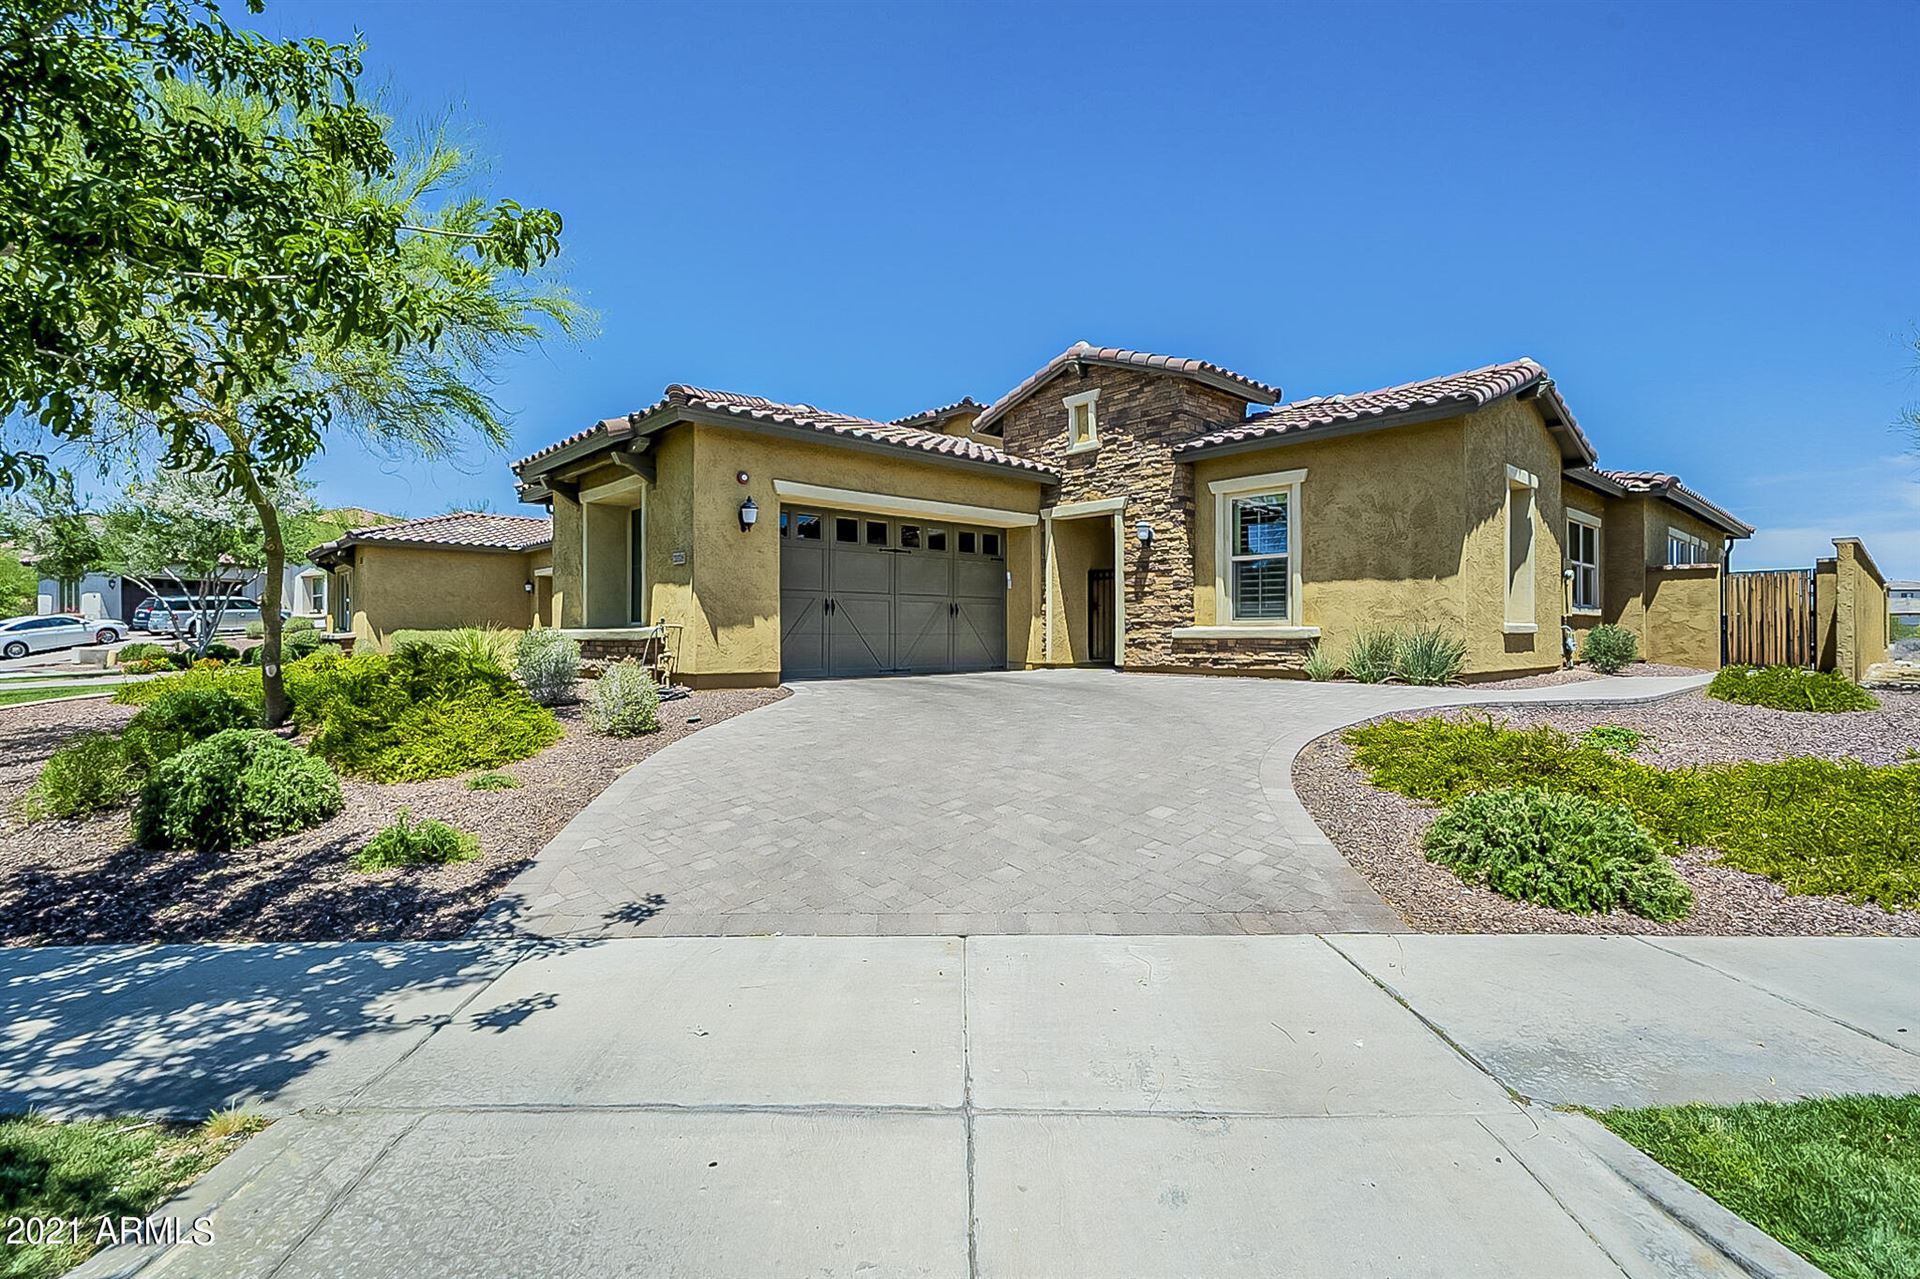 Photo of 20718 W CANYON Drive, Buckeye, AZ 85396 (MLS # 6230900)